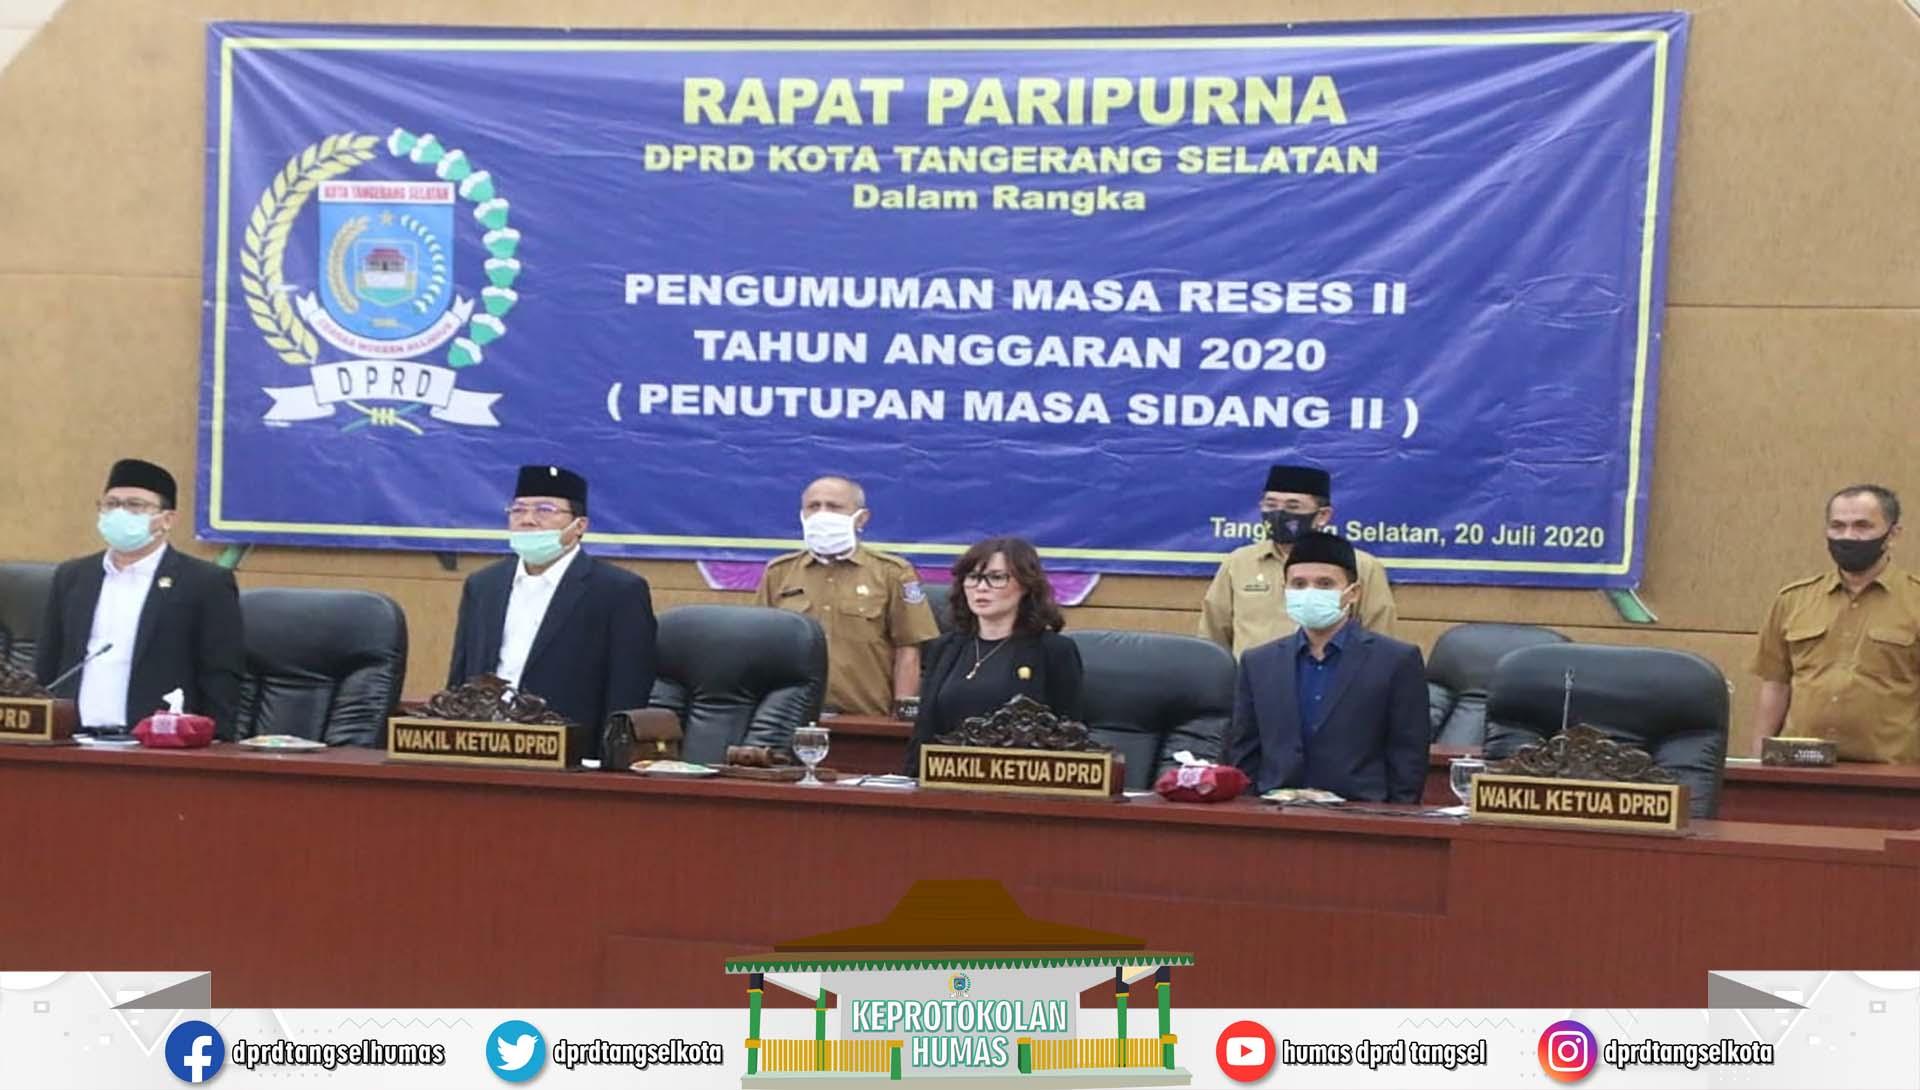 Rapat Paripurna Dengan Agenda Pengumuman Masa Reses II TA 2020